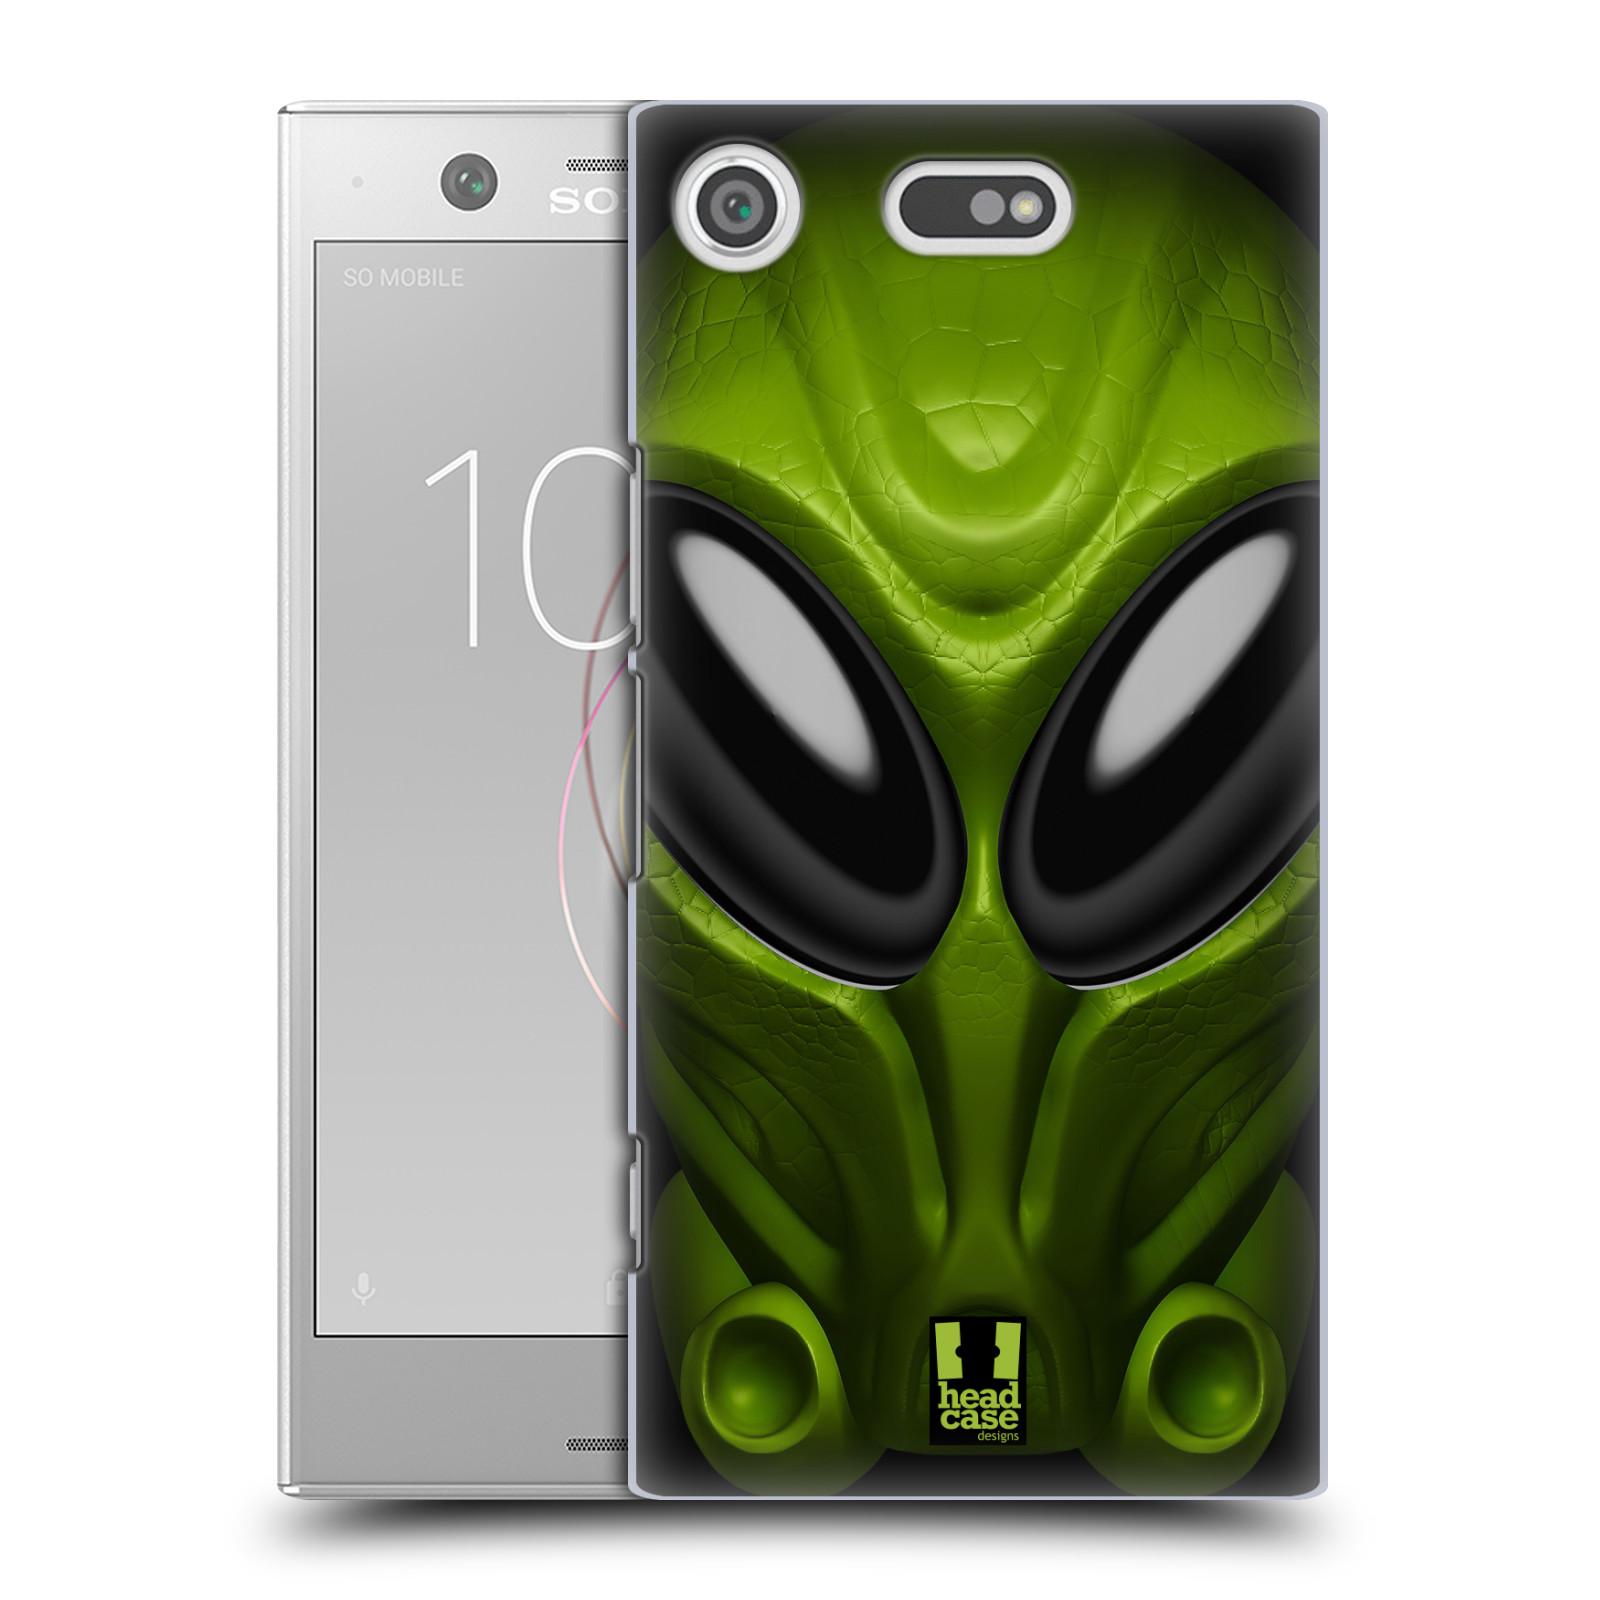 Plastové pouzdro na mobil Sony Xperia XZ1 Compact - Head Case - Ufoun Mastermind (Plastový kryt či obal na mobilní telefon Sony Xperia XZ1 Compact G8441 s motivem Ufoun Mastermind)